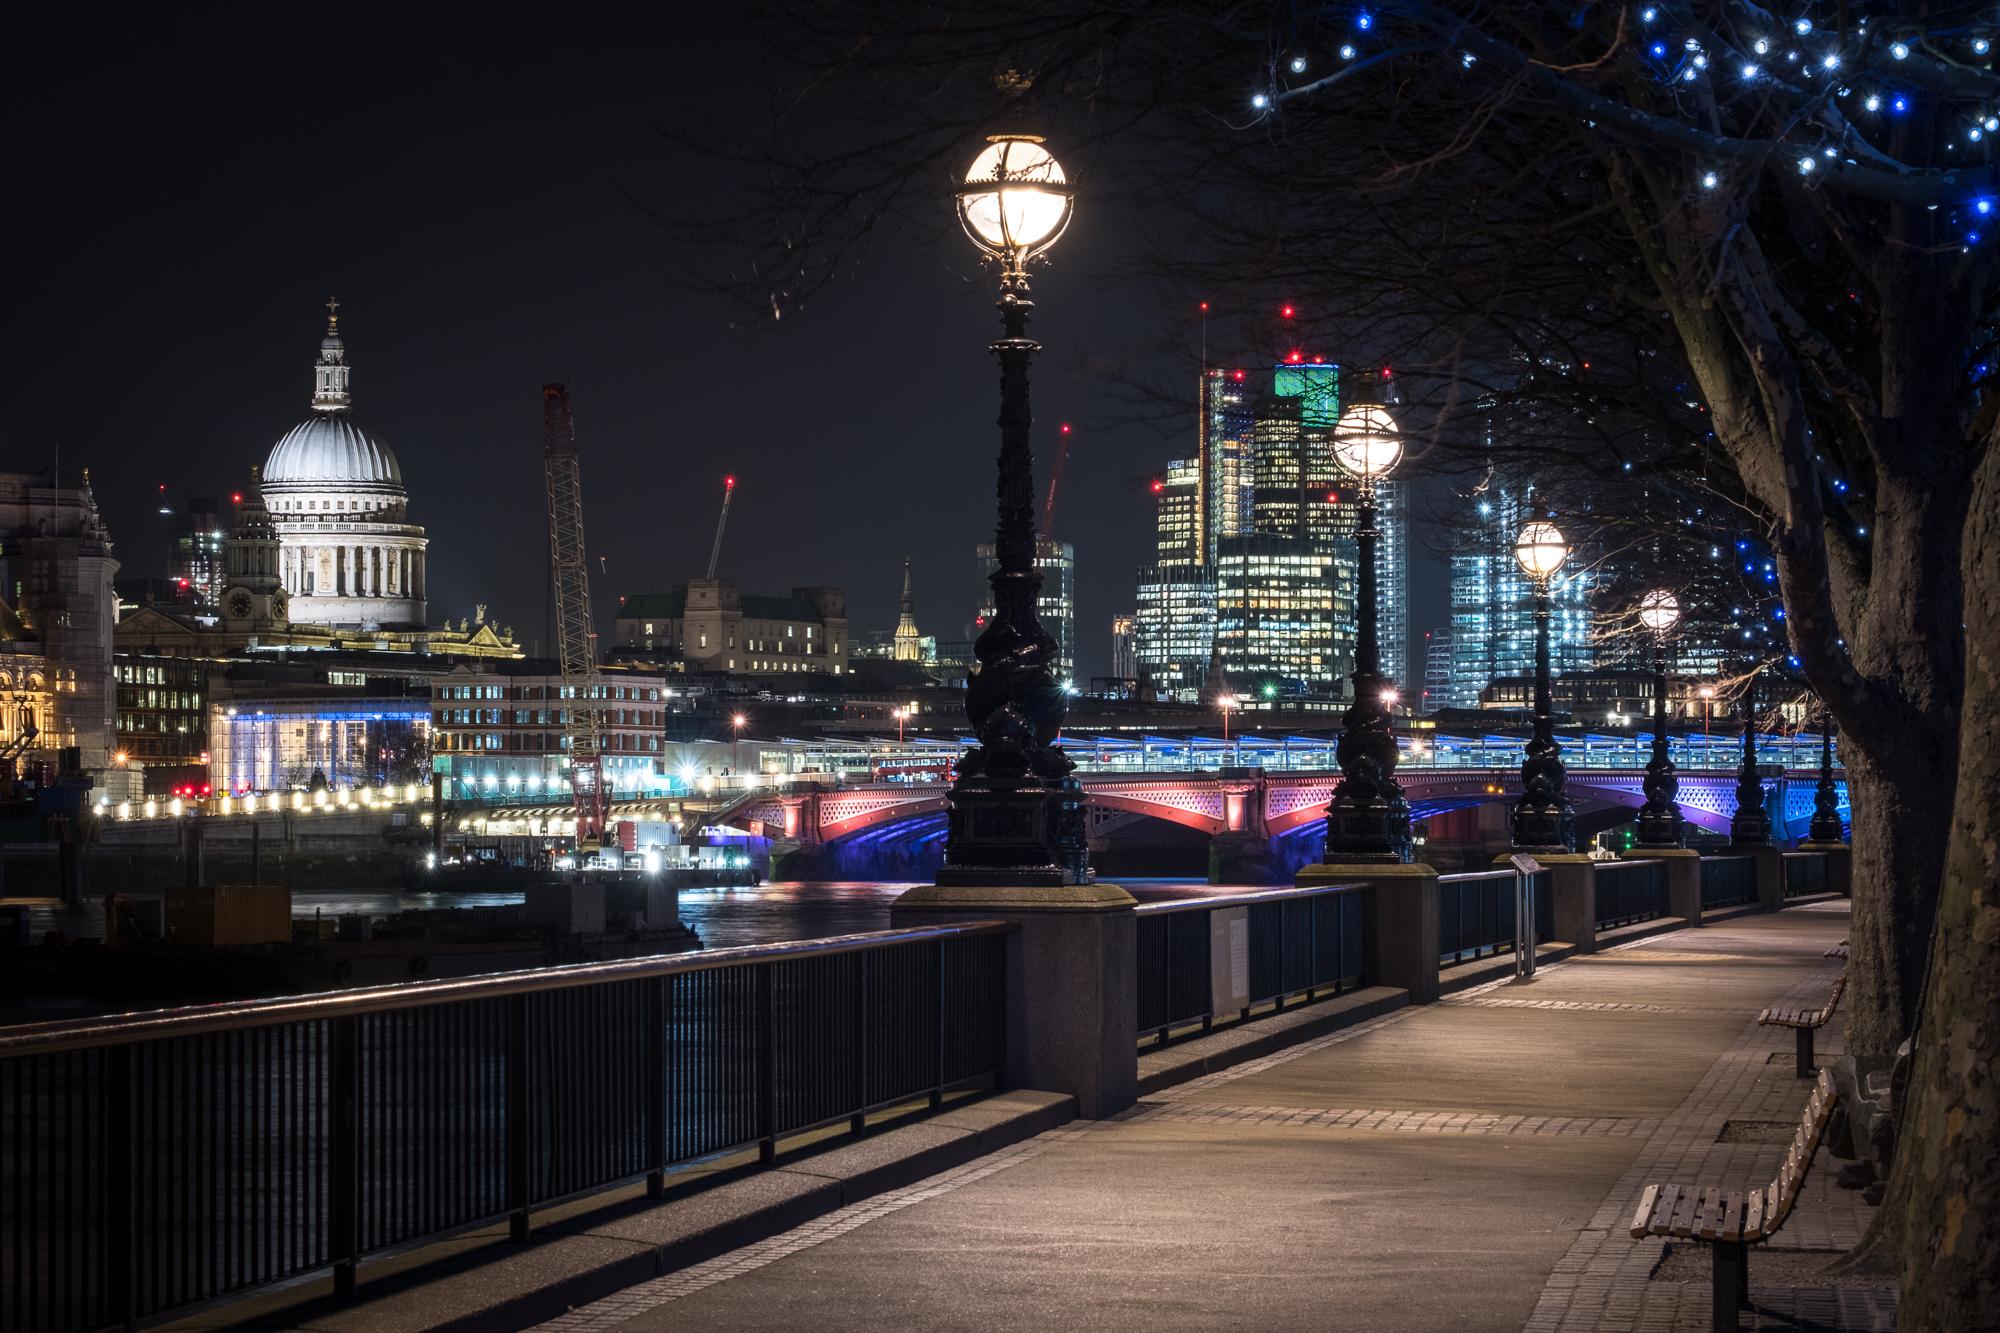 180129 - London - Night - South Bank 002.jpg